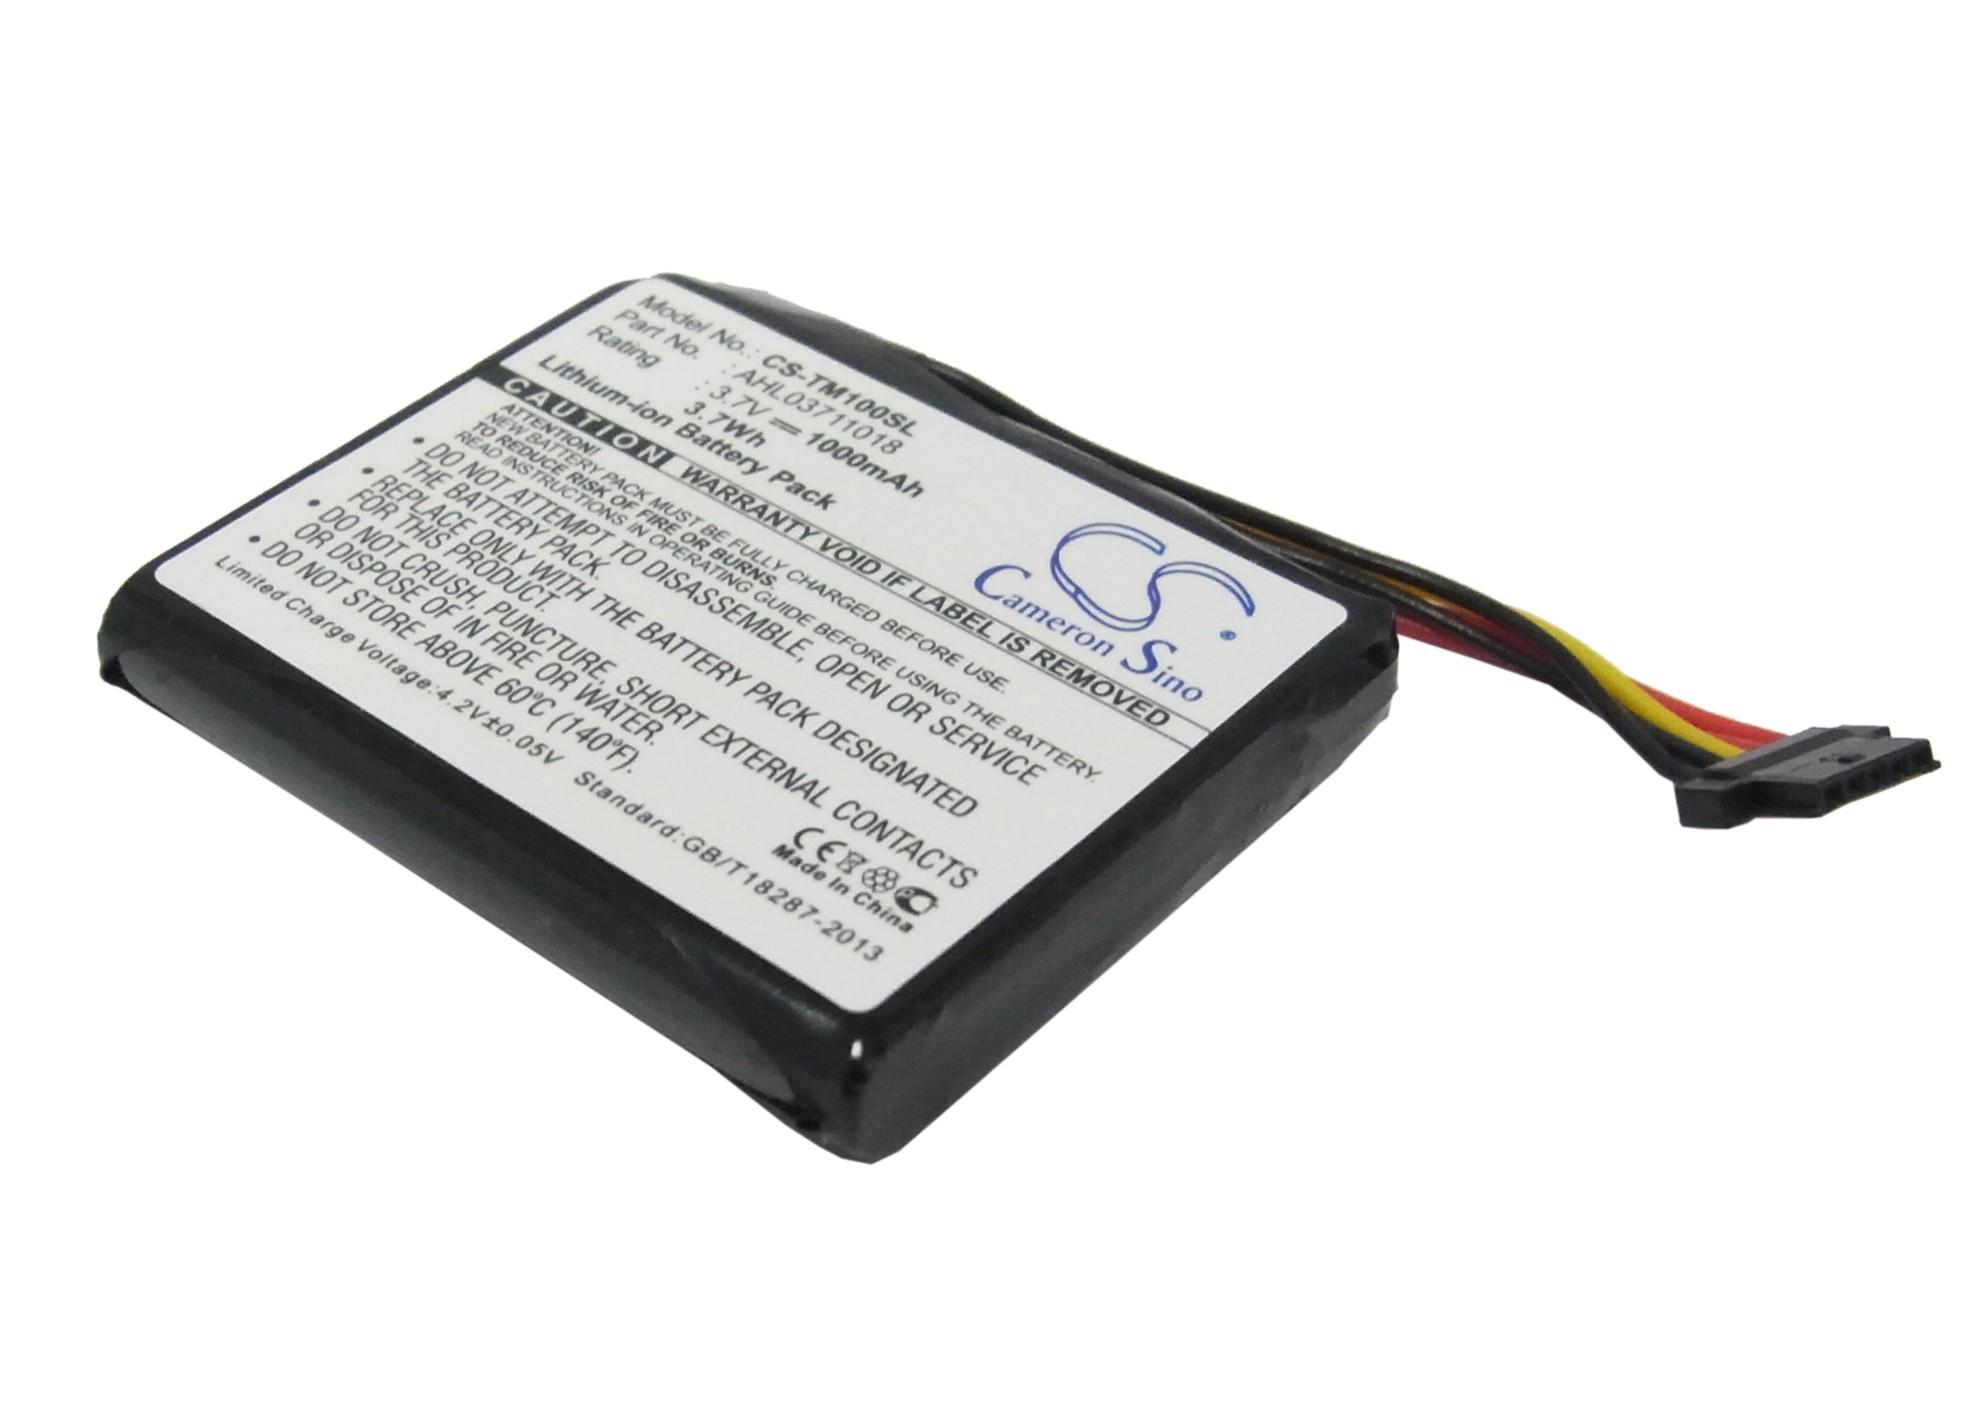 Cameron Sino baterie do navigací (gps) pro TOMTOM Go Live 1005 3.7V Li-ion 1000mAh černá - neoriginální